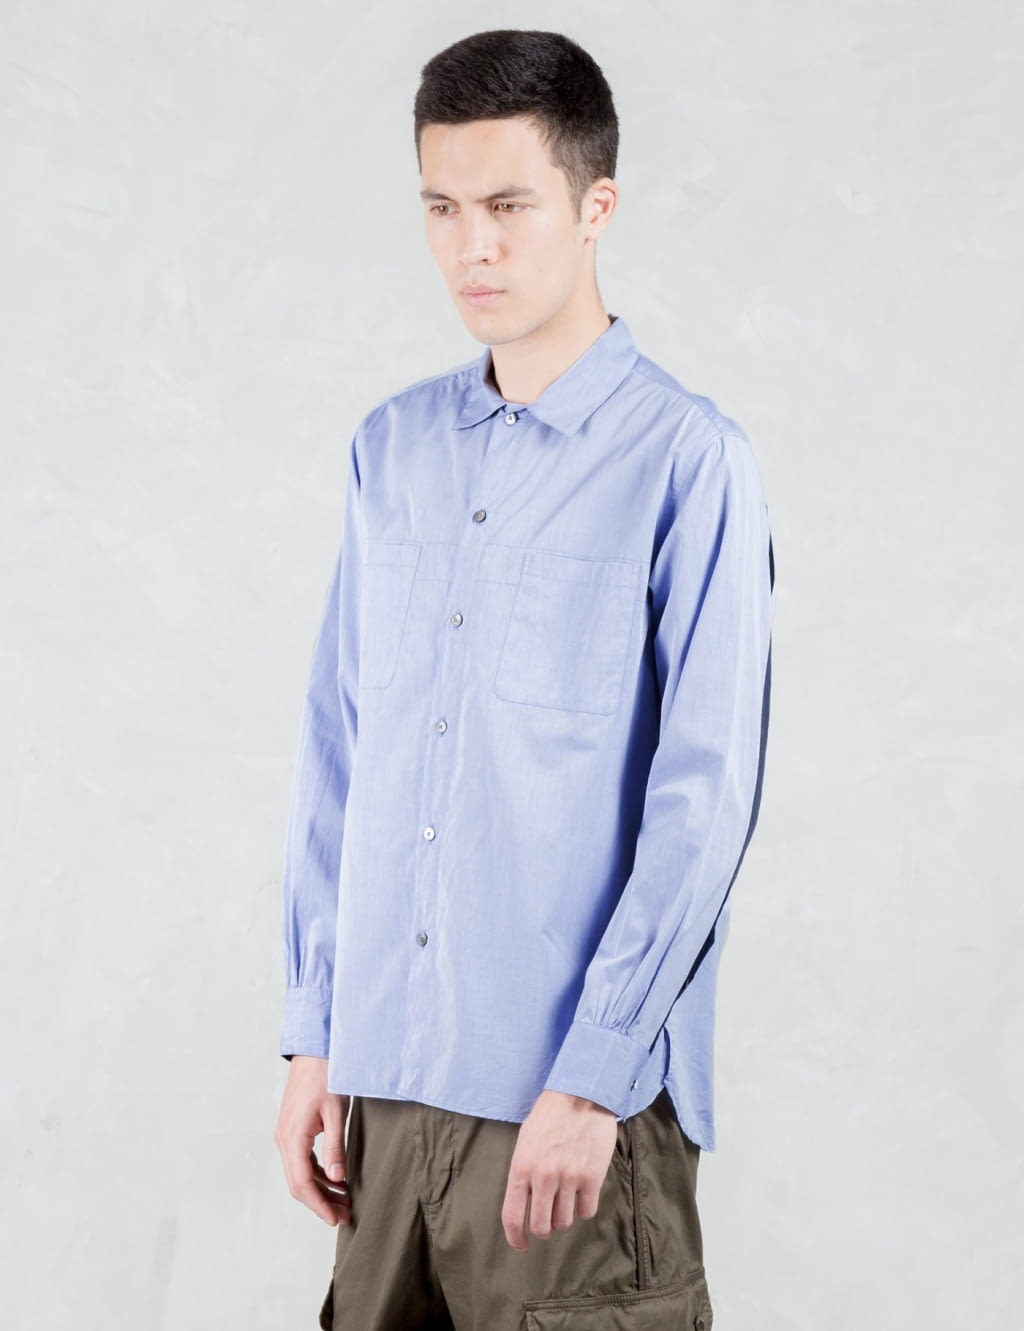 Jual Vallis By Factotum Tapered L S Shirt 100 Original Bobobobo Celana Pendek Jeans Double Stripe Soft Blue